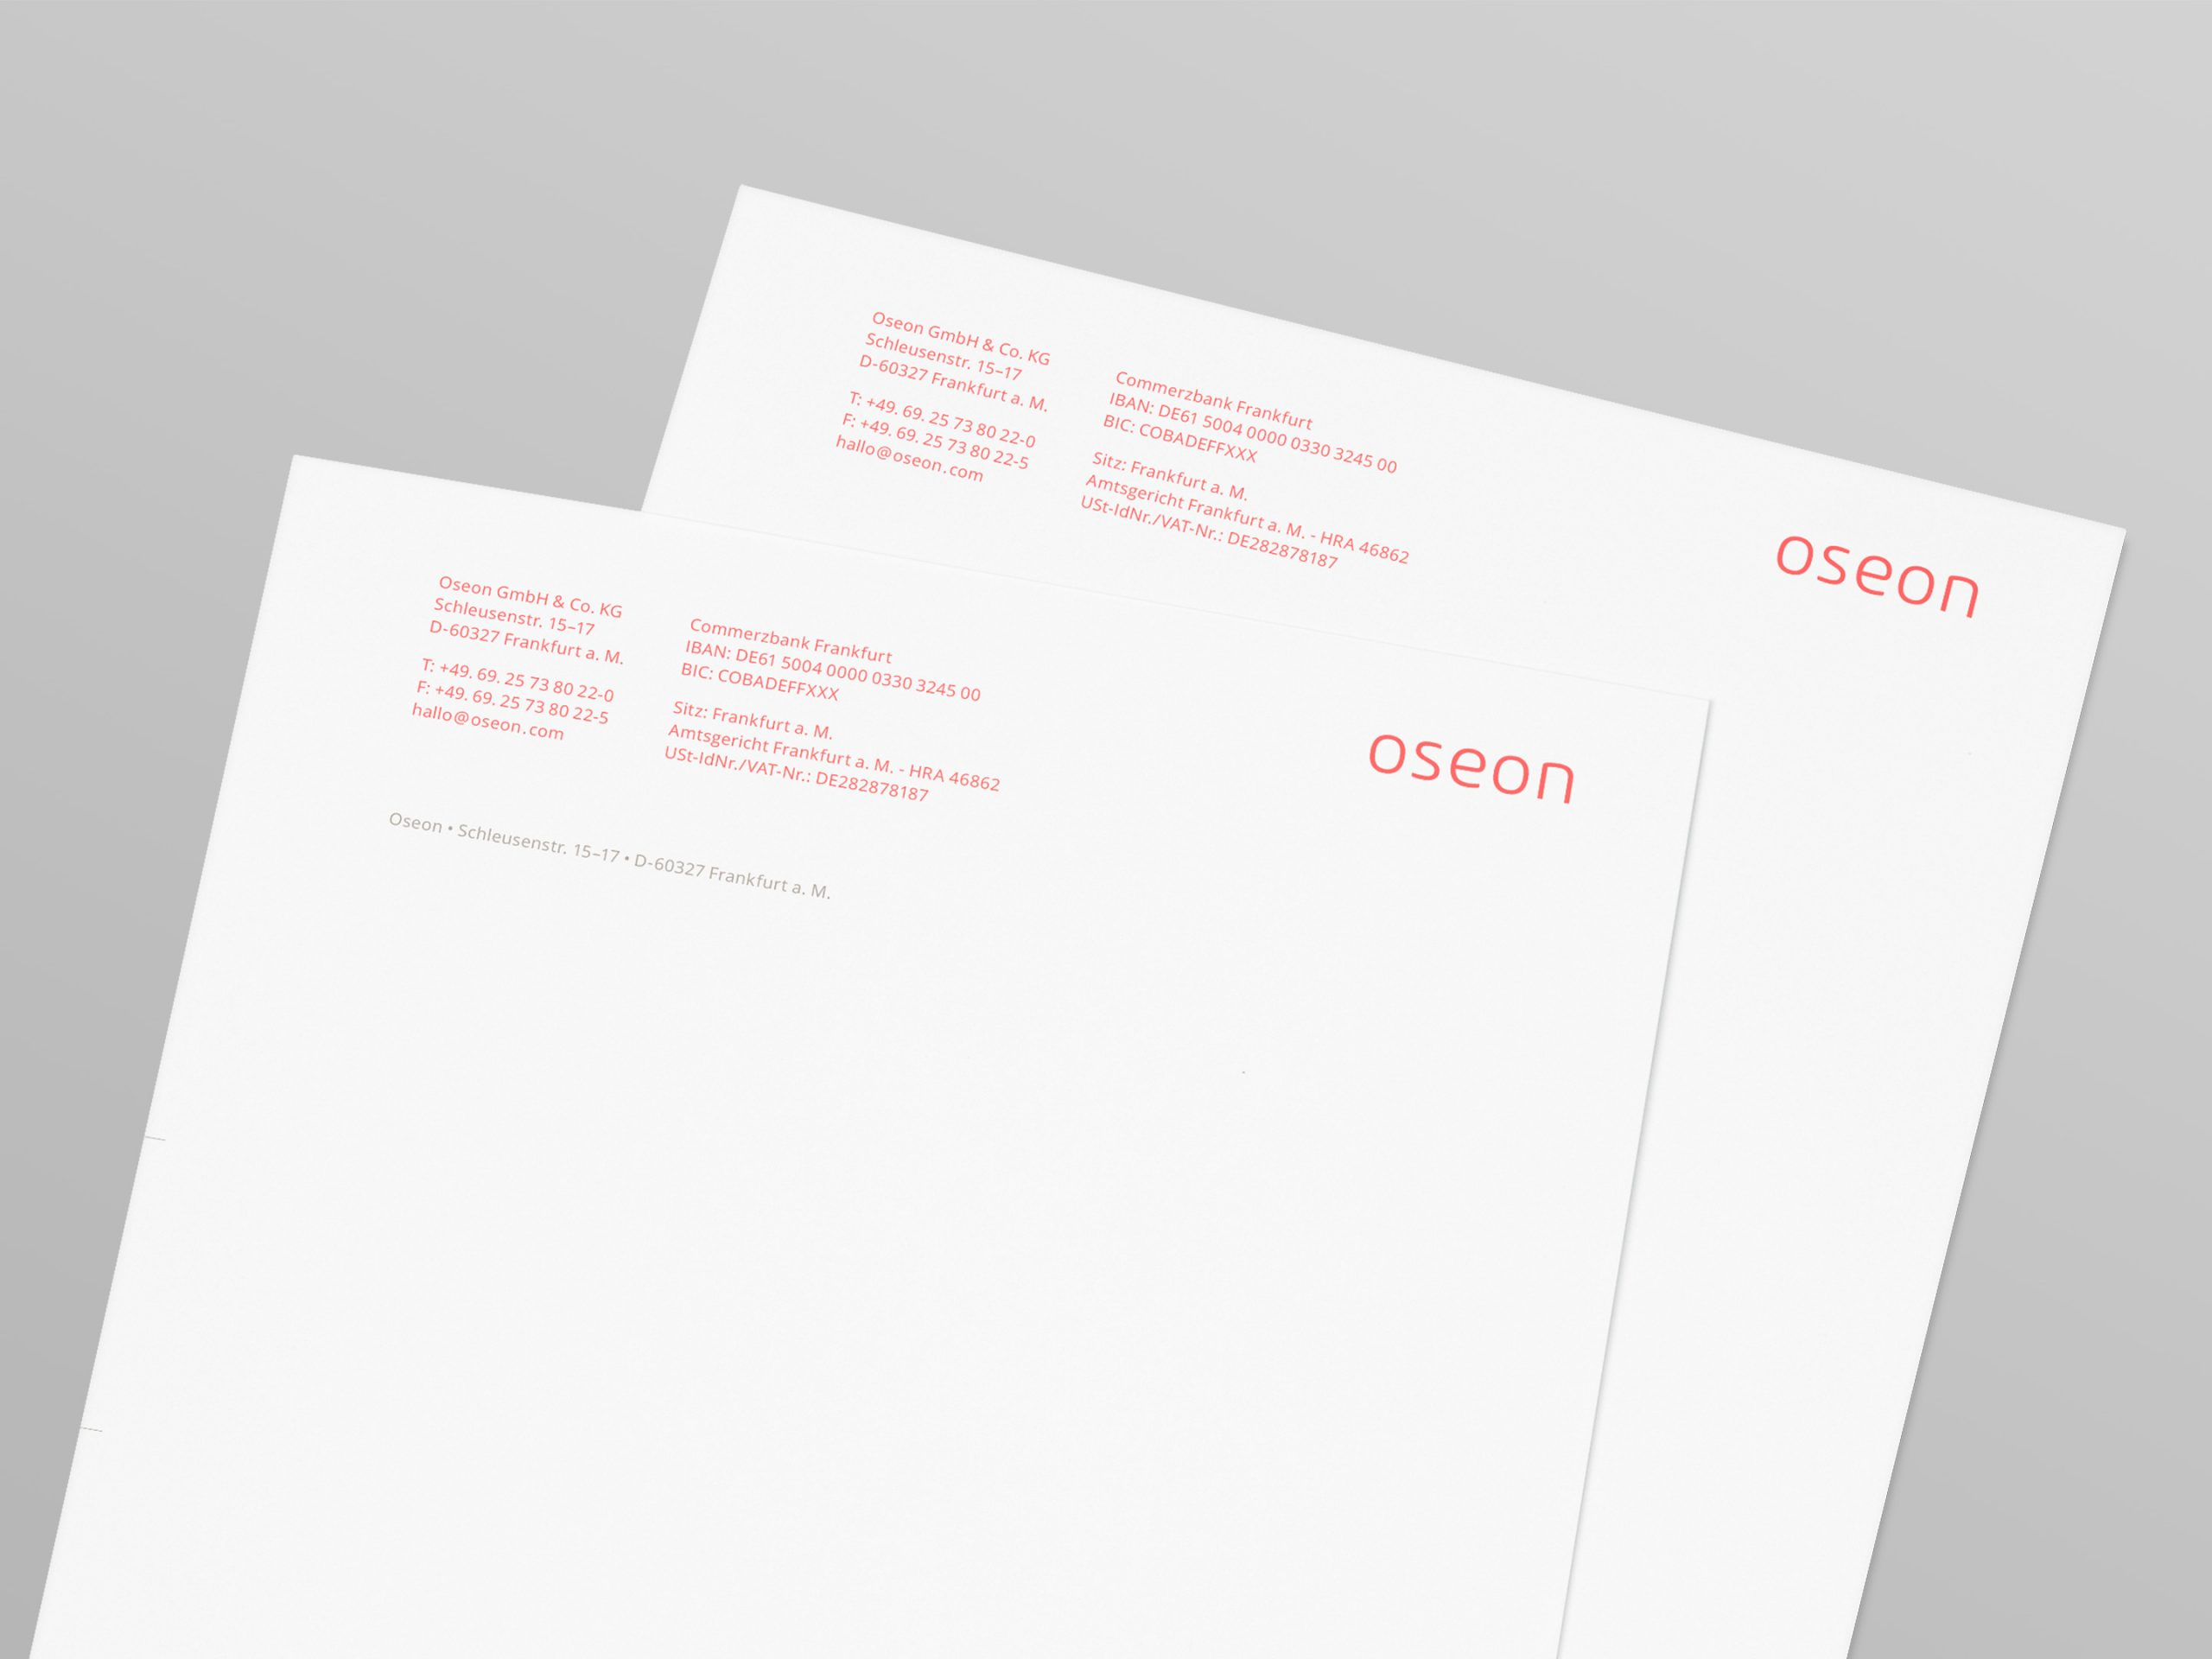 oseon-slider_p42